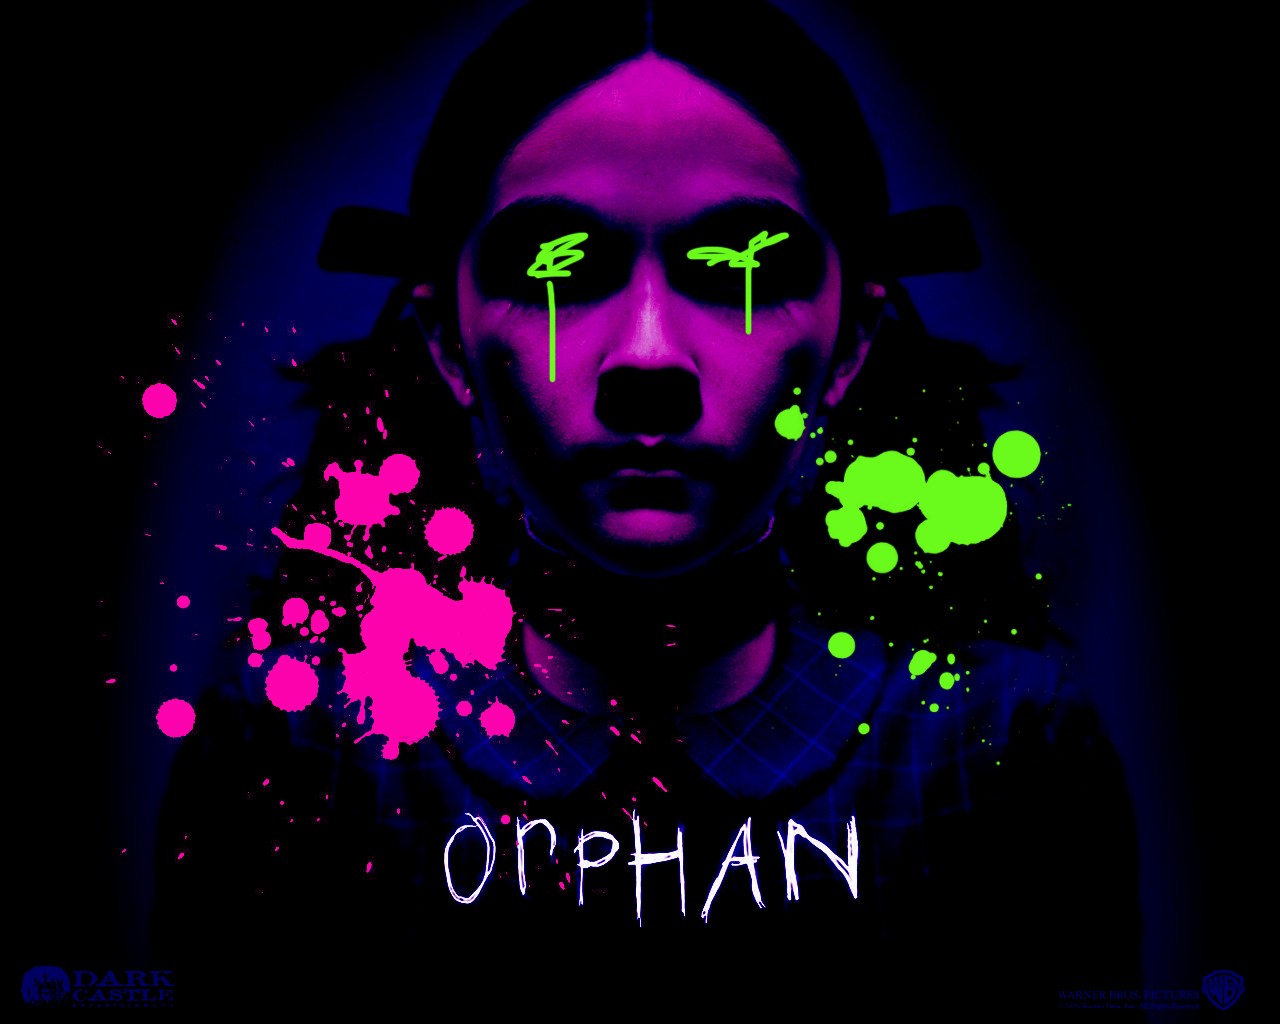 Orphan Wallpaper by tat76 1280x1024